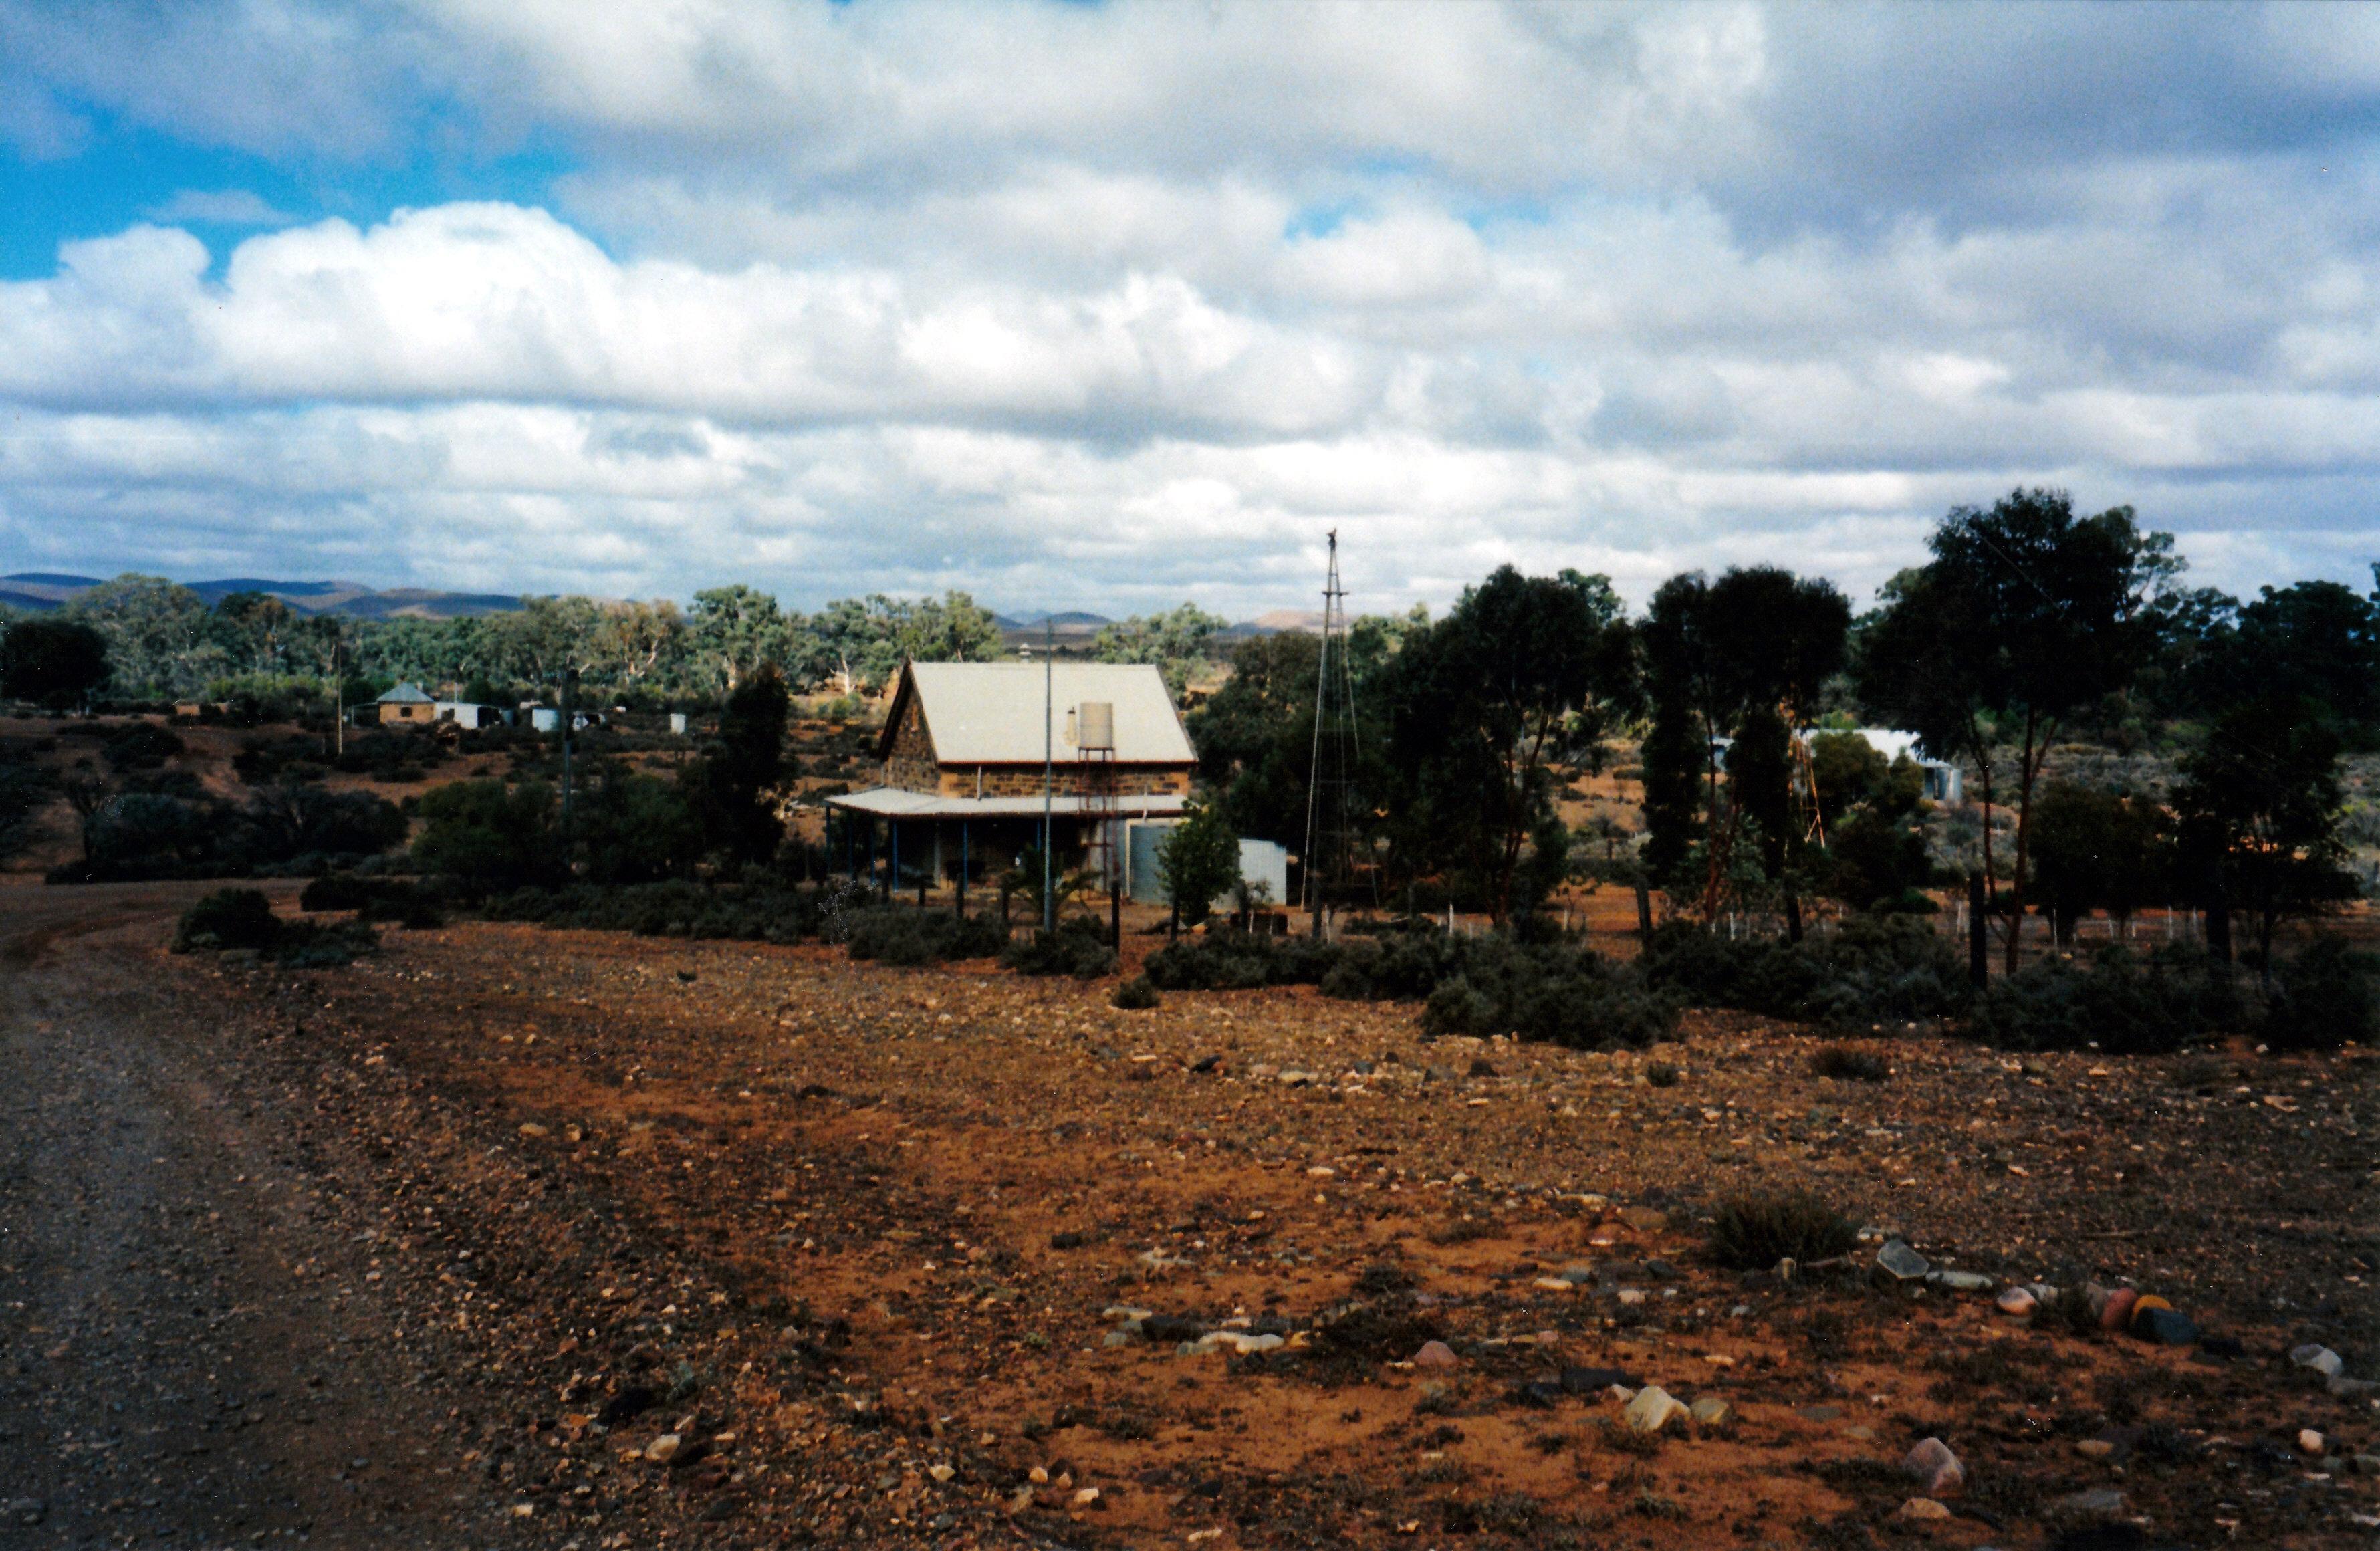 05-23-1999 03 Old schoolhouse Beltana